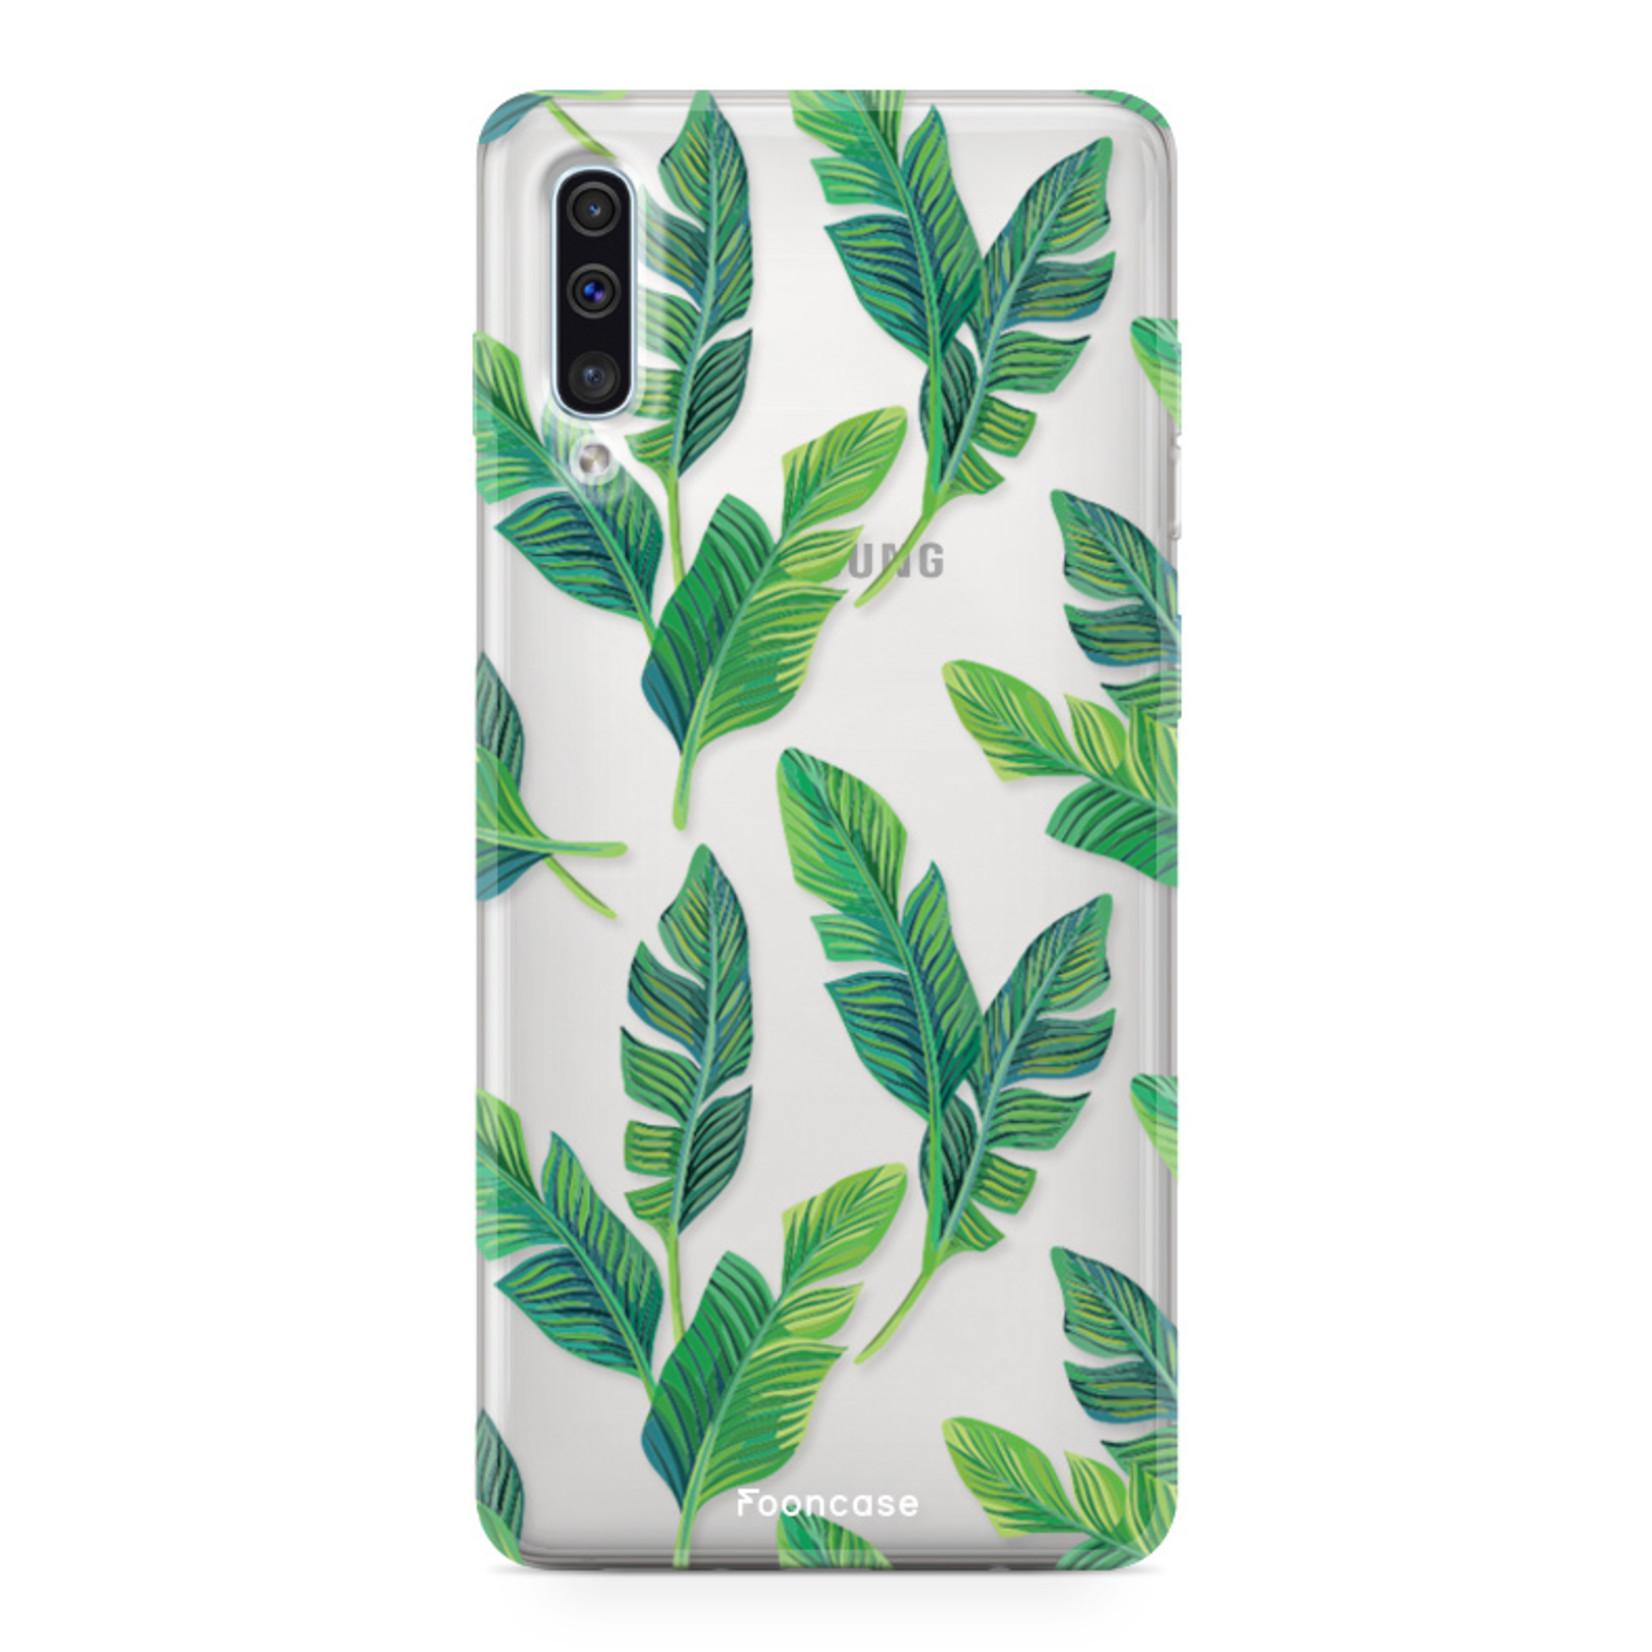 FOONCASE Samsung Galaxy A50 hoesje TPU Soft Case - Back Cover - Banana leaves / Bananen bladeren